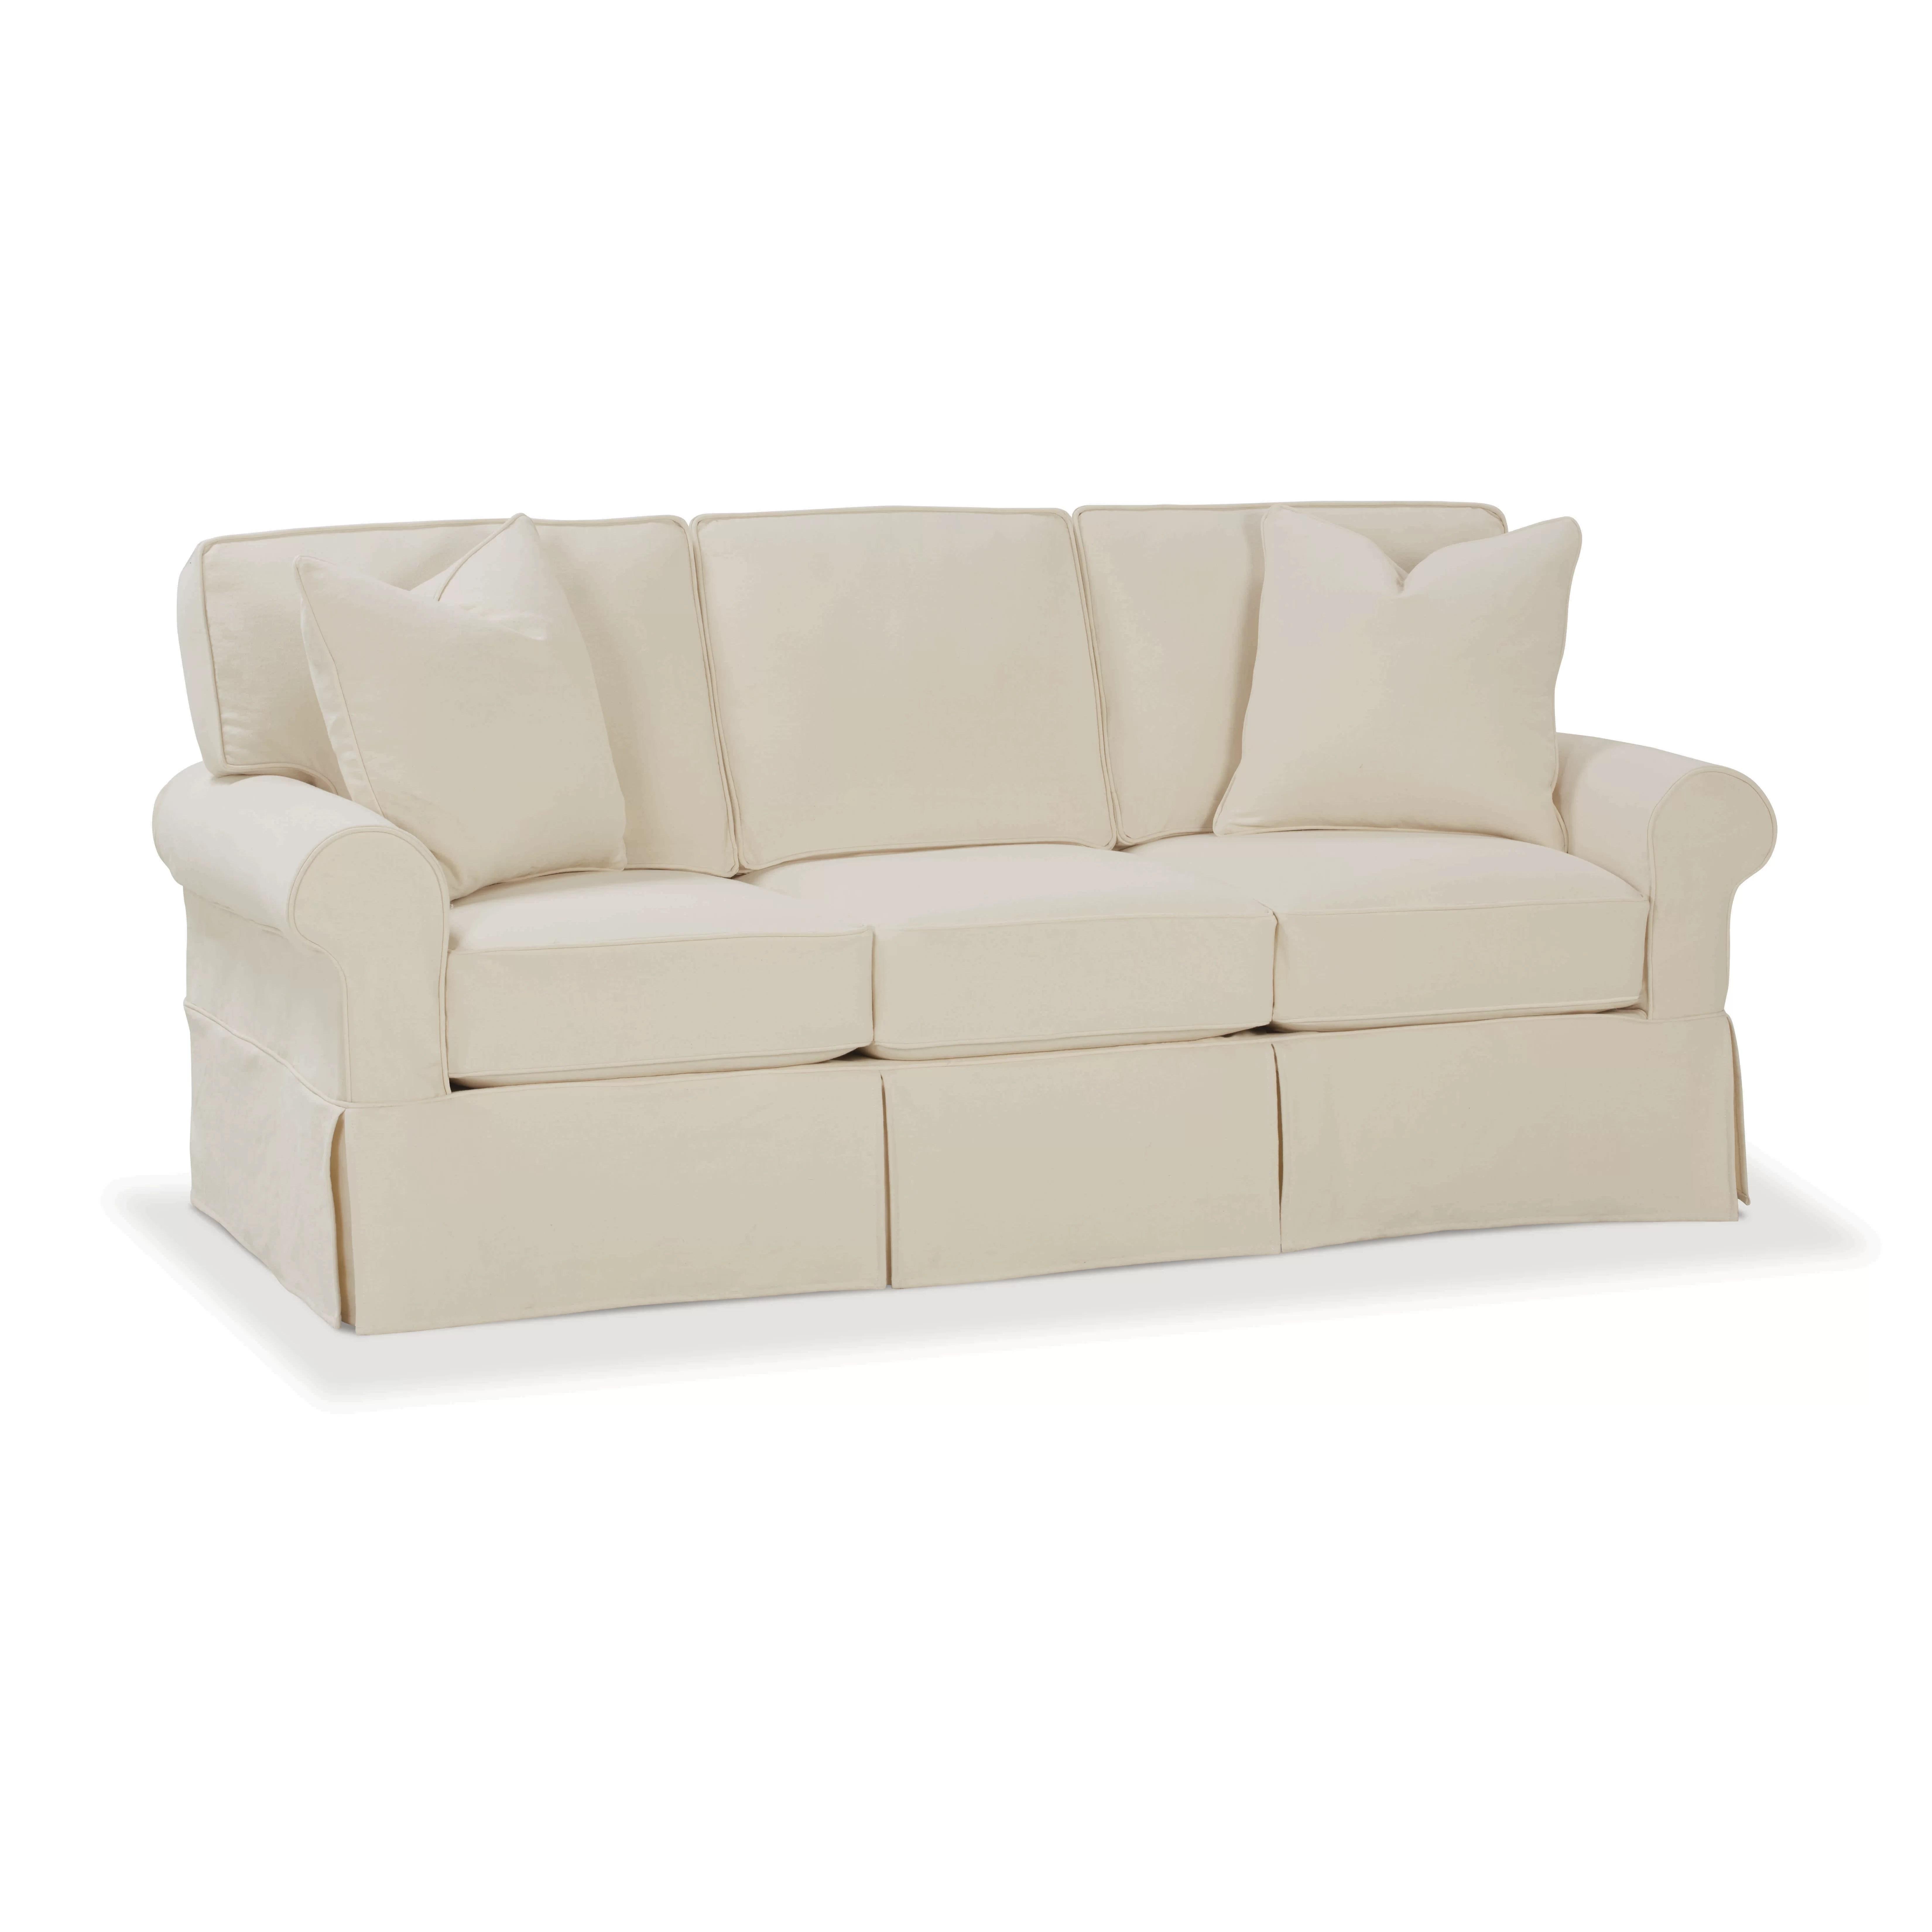 rowe slipcover sofa sofas and loveseats made in usa furniture nantucket slipcovered sleeper